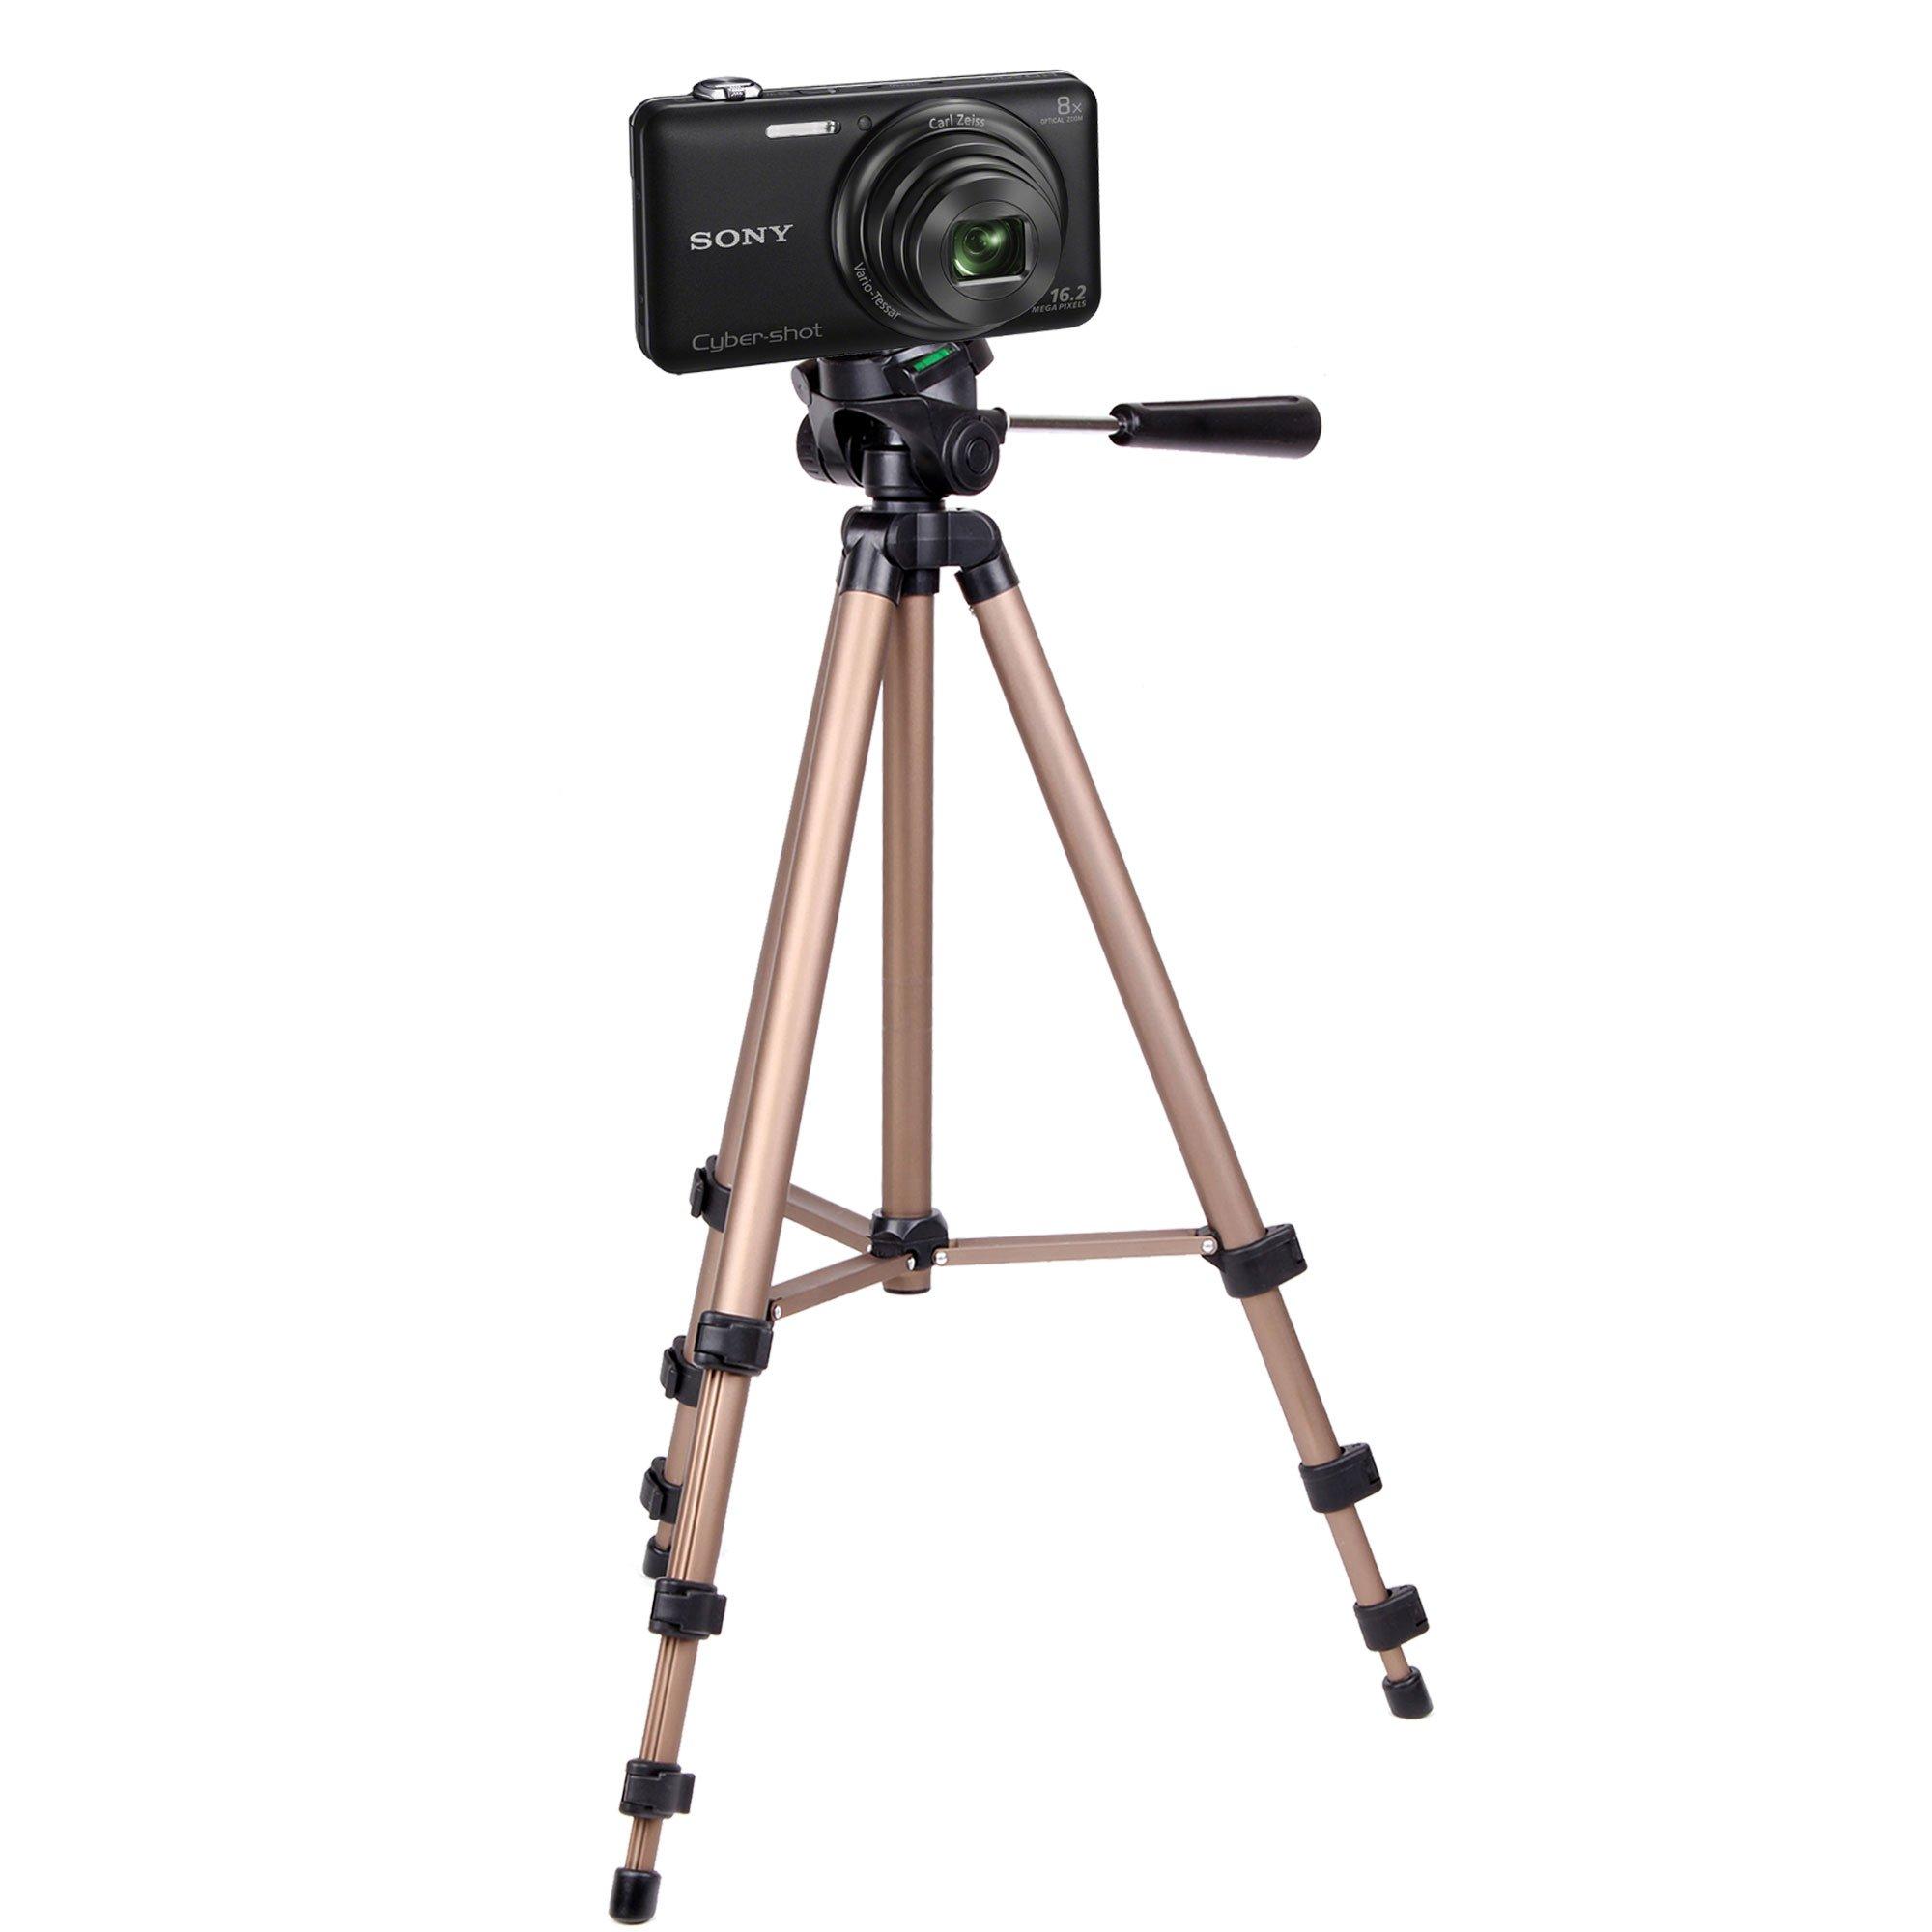 DURAGADGET Professional Lightweight Aluminium Tripod for Sony Cybershot WX200, Cybershot DSC-W730 & Sony H200 Digital Cameras